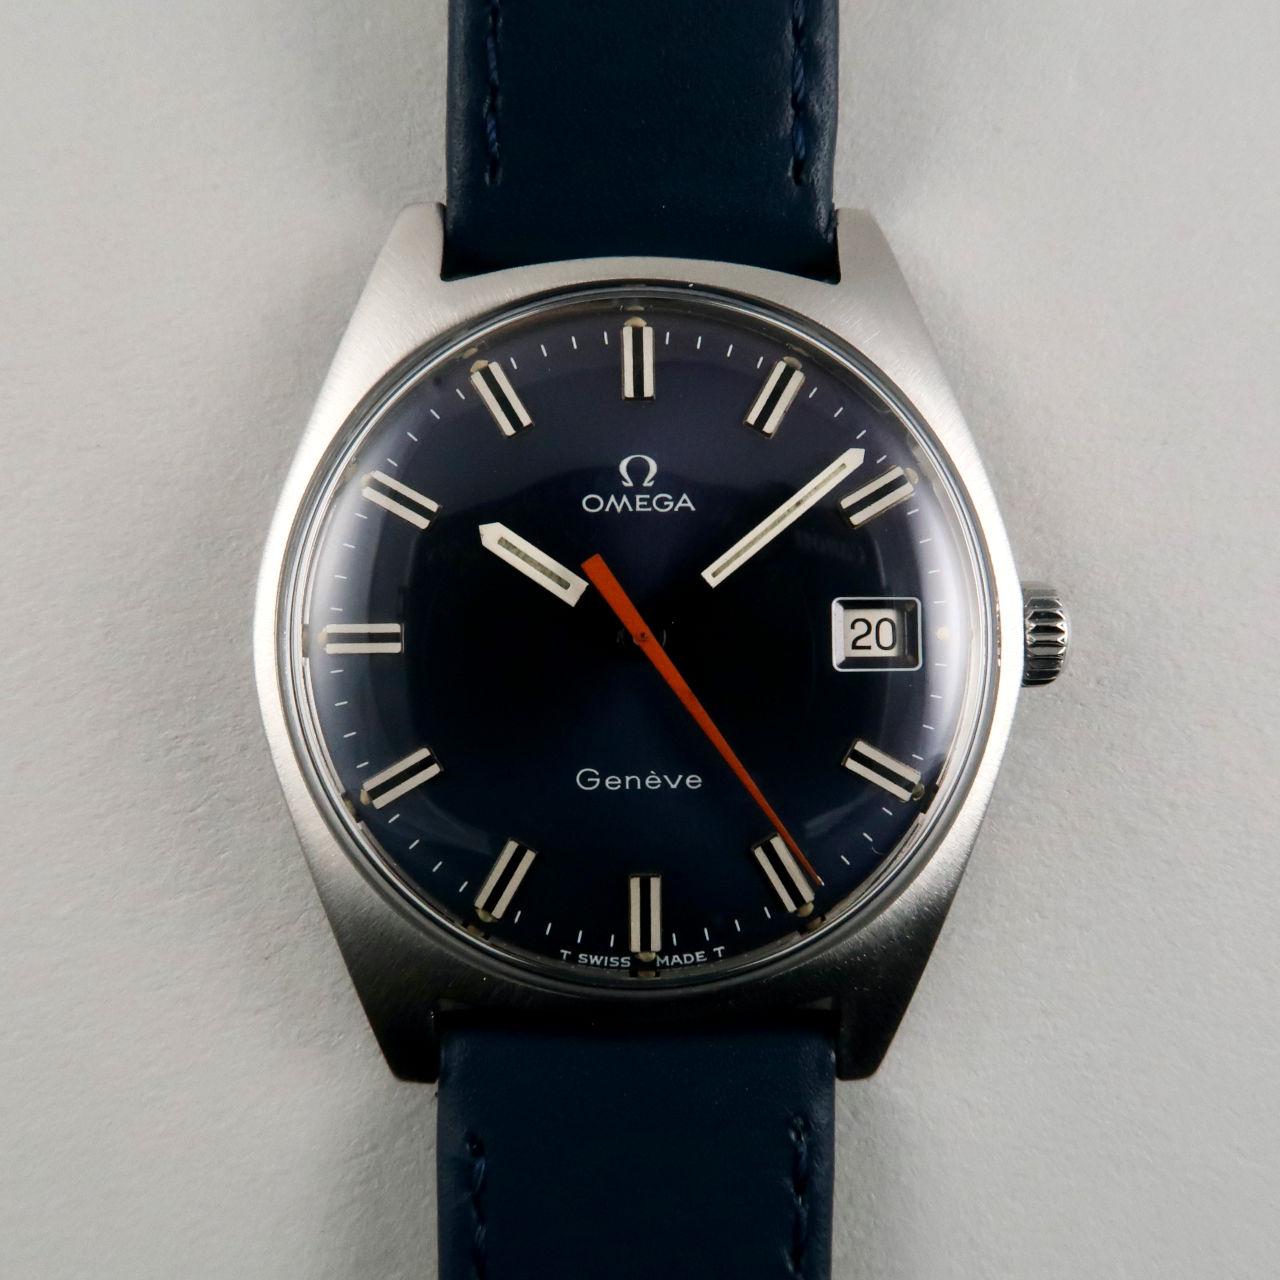 Omega Genève Ref. 136.041 circa 1968 blue dial